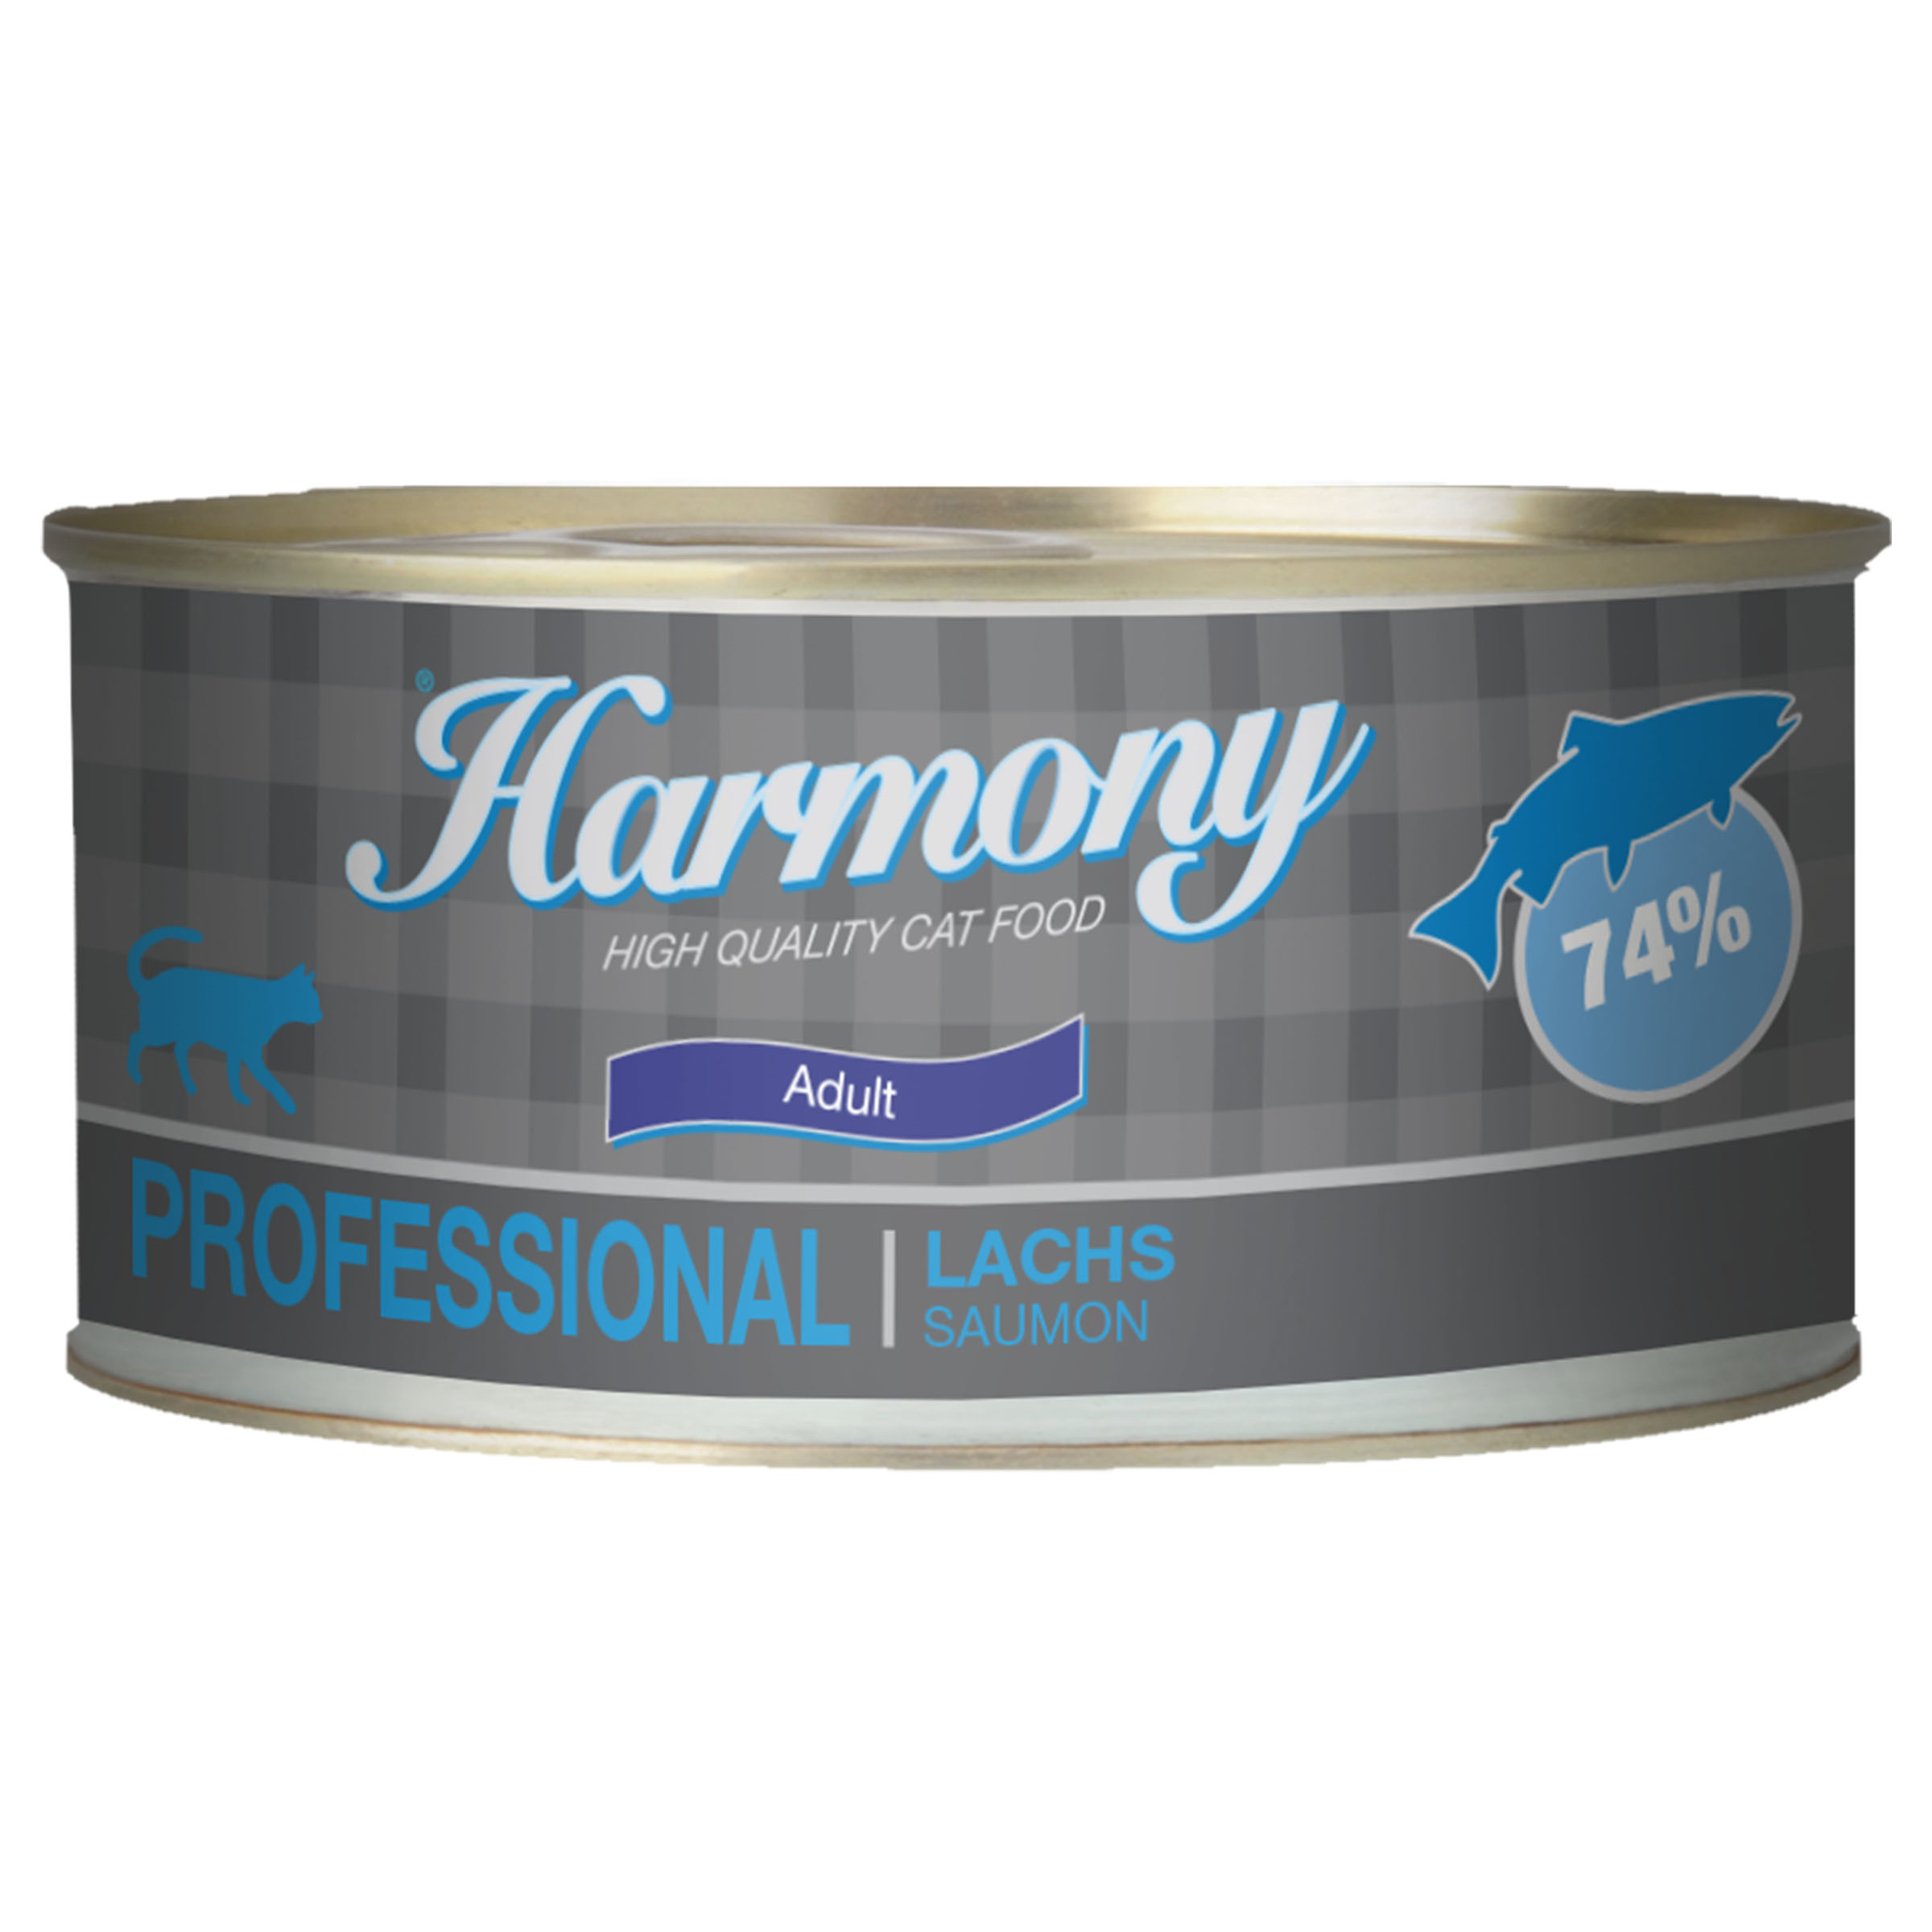 Harmony Cat Professional Adult Lachs Katzenfutter